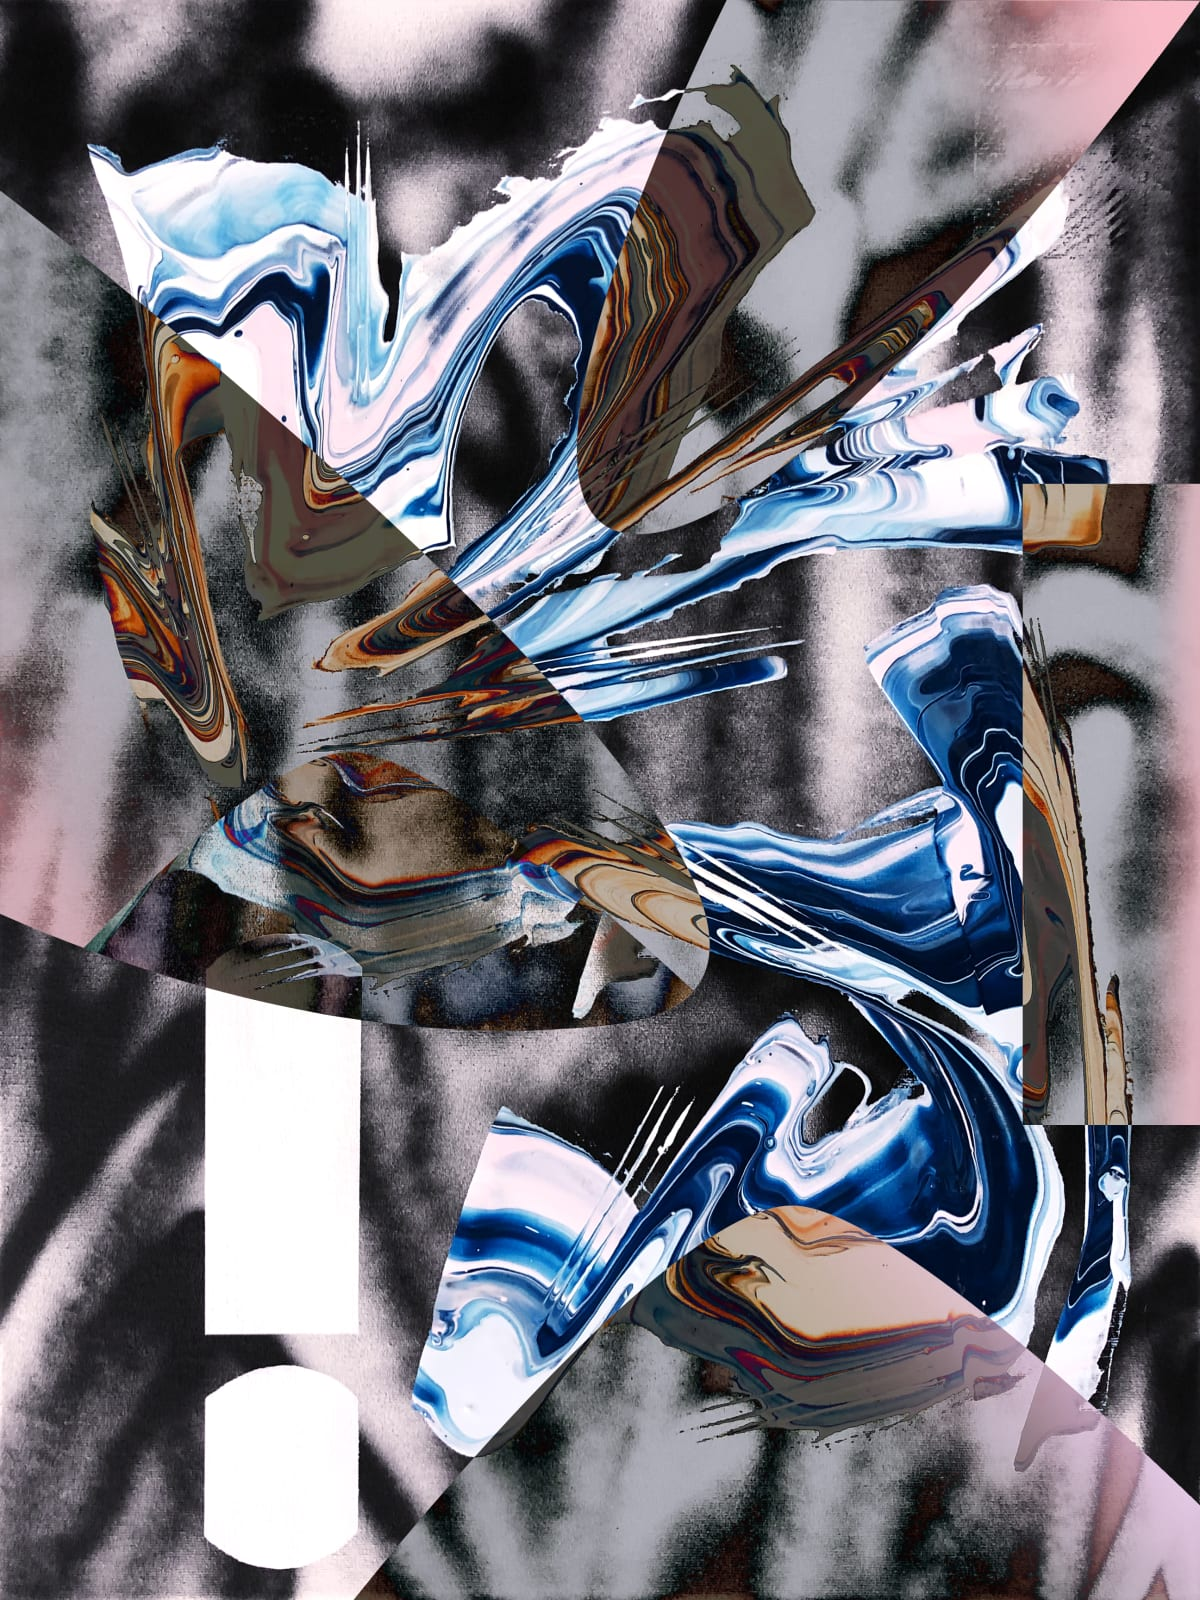 Jay Jermyn Filtration 012, 2019 Acrylic & Spray Paint on Canvas 61 x 45.7 cm 24 1/2 x 18 in